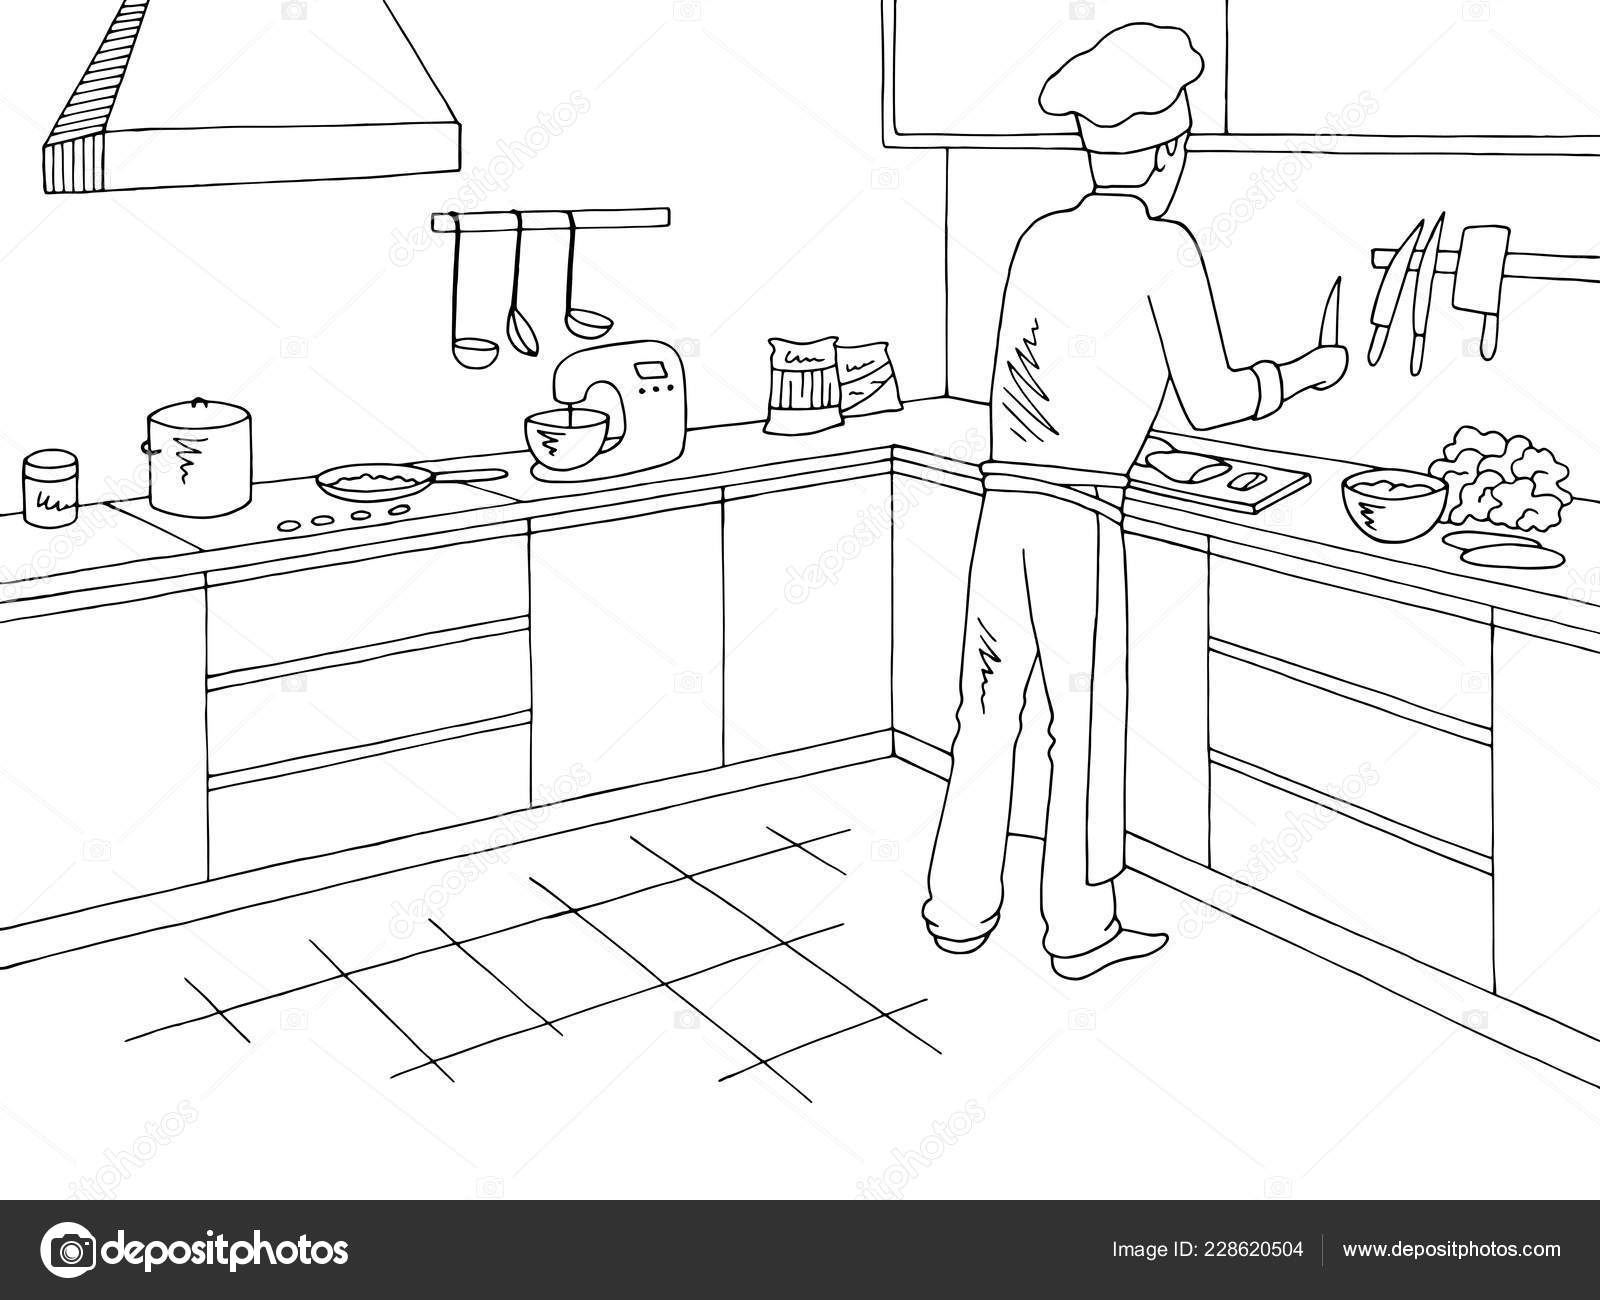 Cook Cutting Ingredients Restaurant Kitchen Room Graphic Black White Interior Stock Vector C Aluna11 228620504